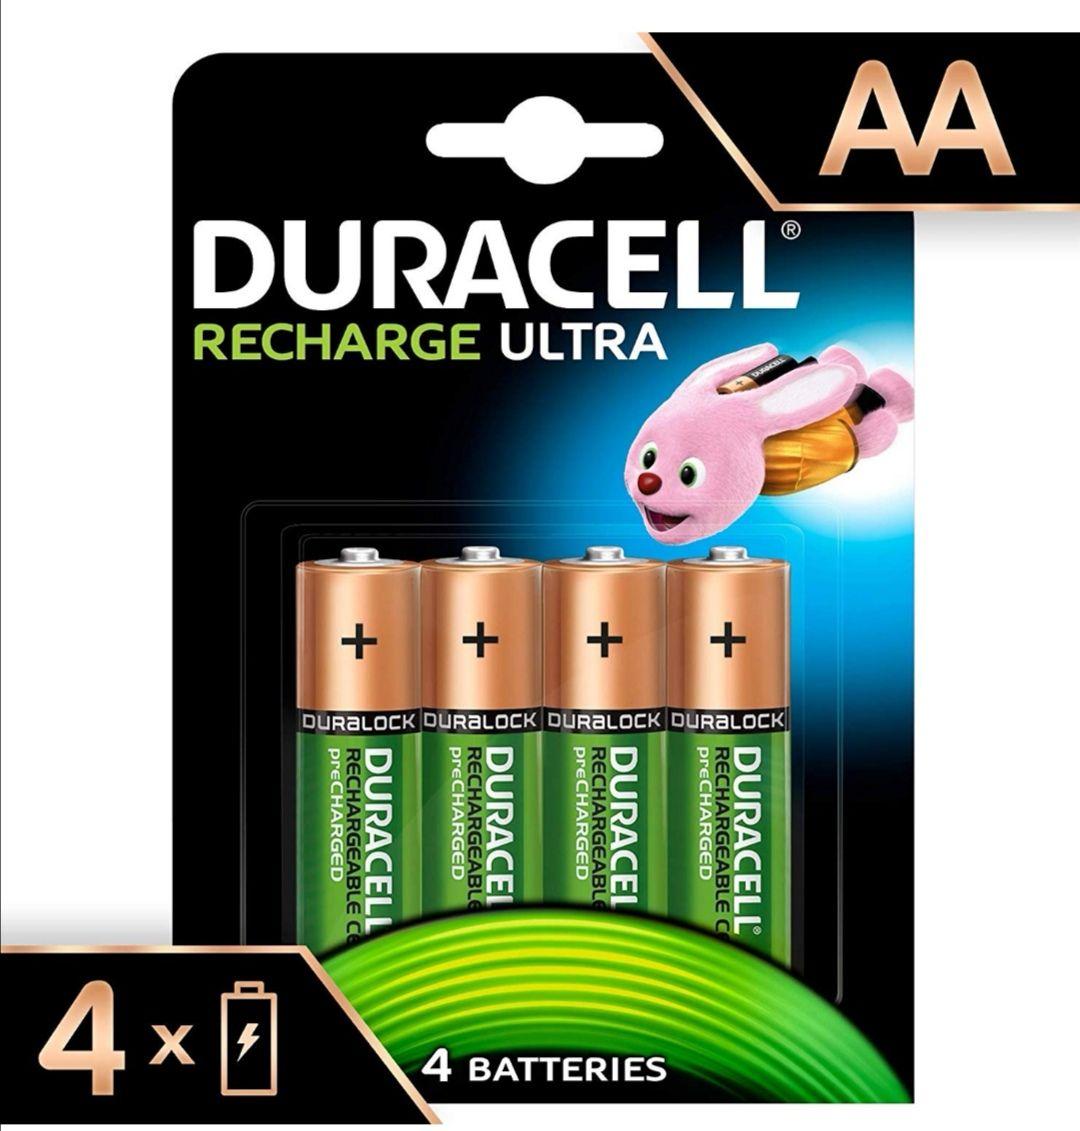 Lot de 4 piles rechargeables Duracell - AA, 2500 mAh